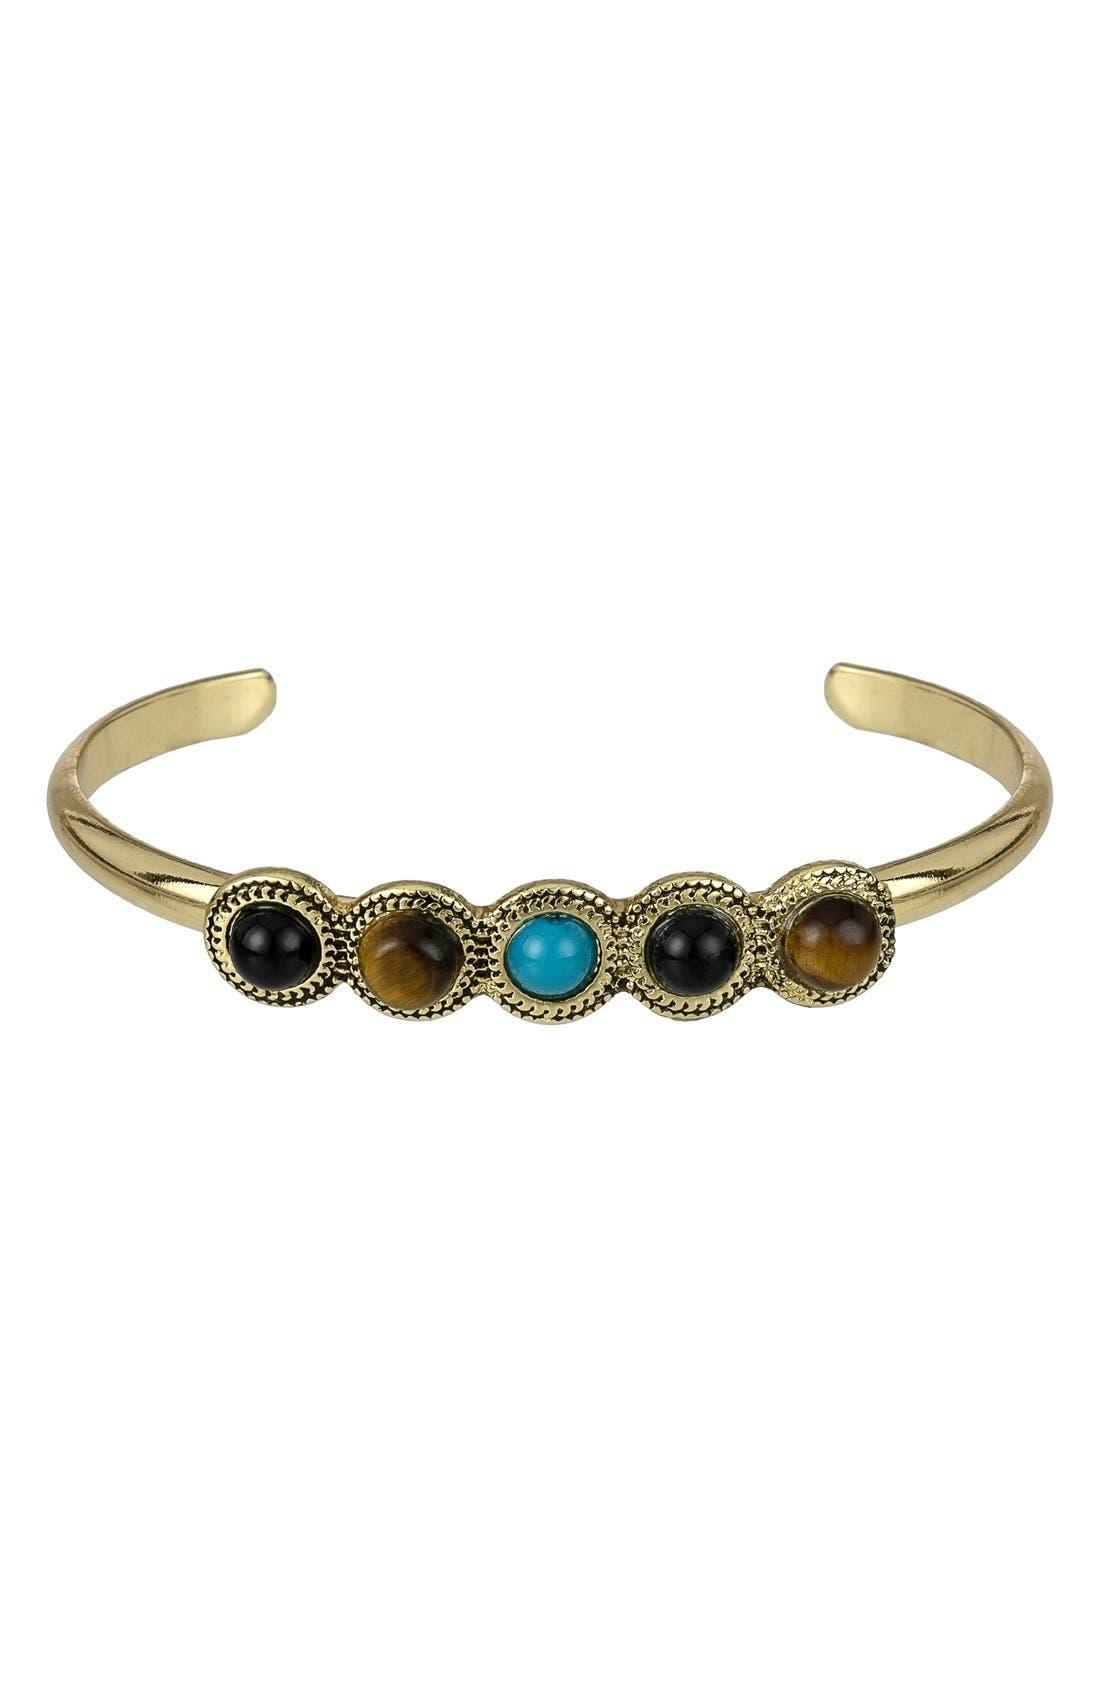 Main Image - Sam Edelman Stone Cuff Bracelet